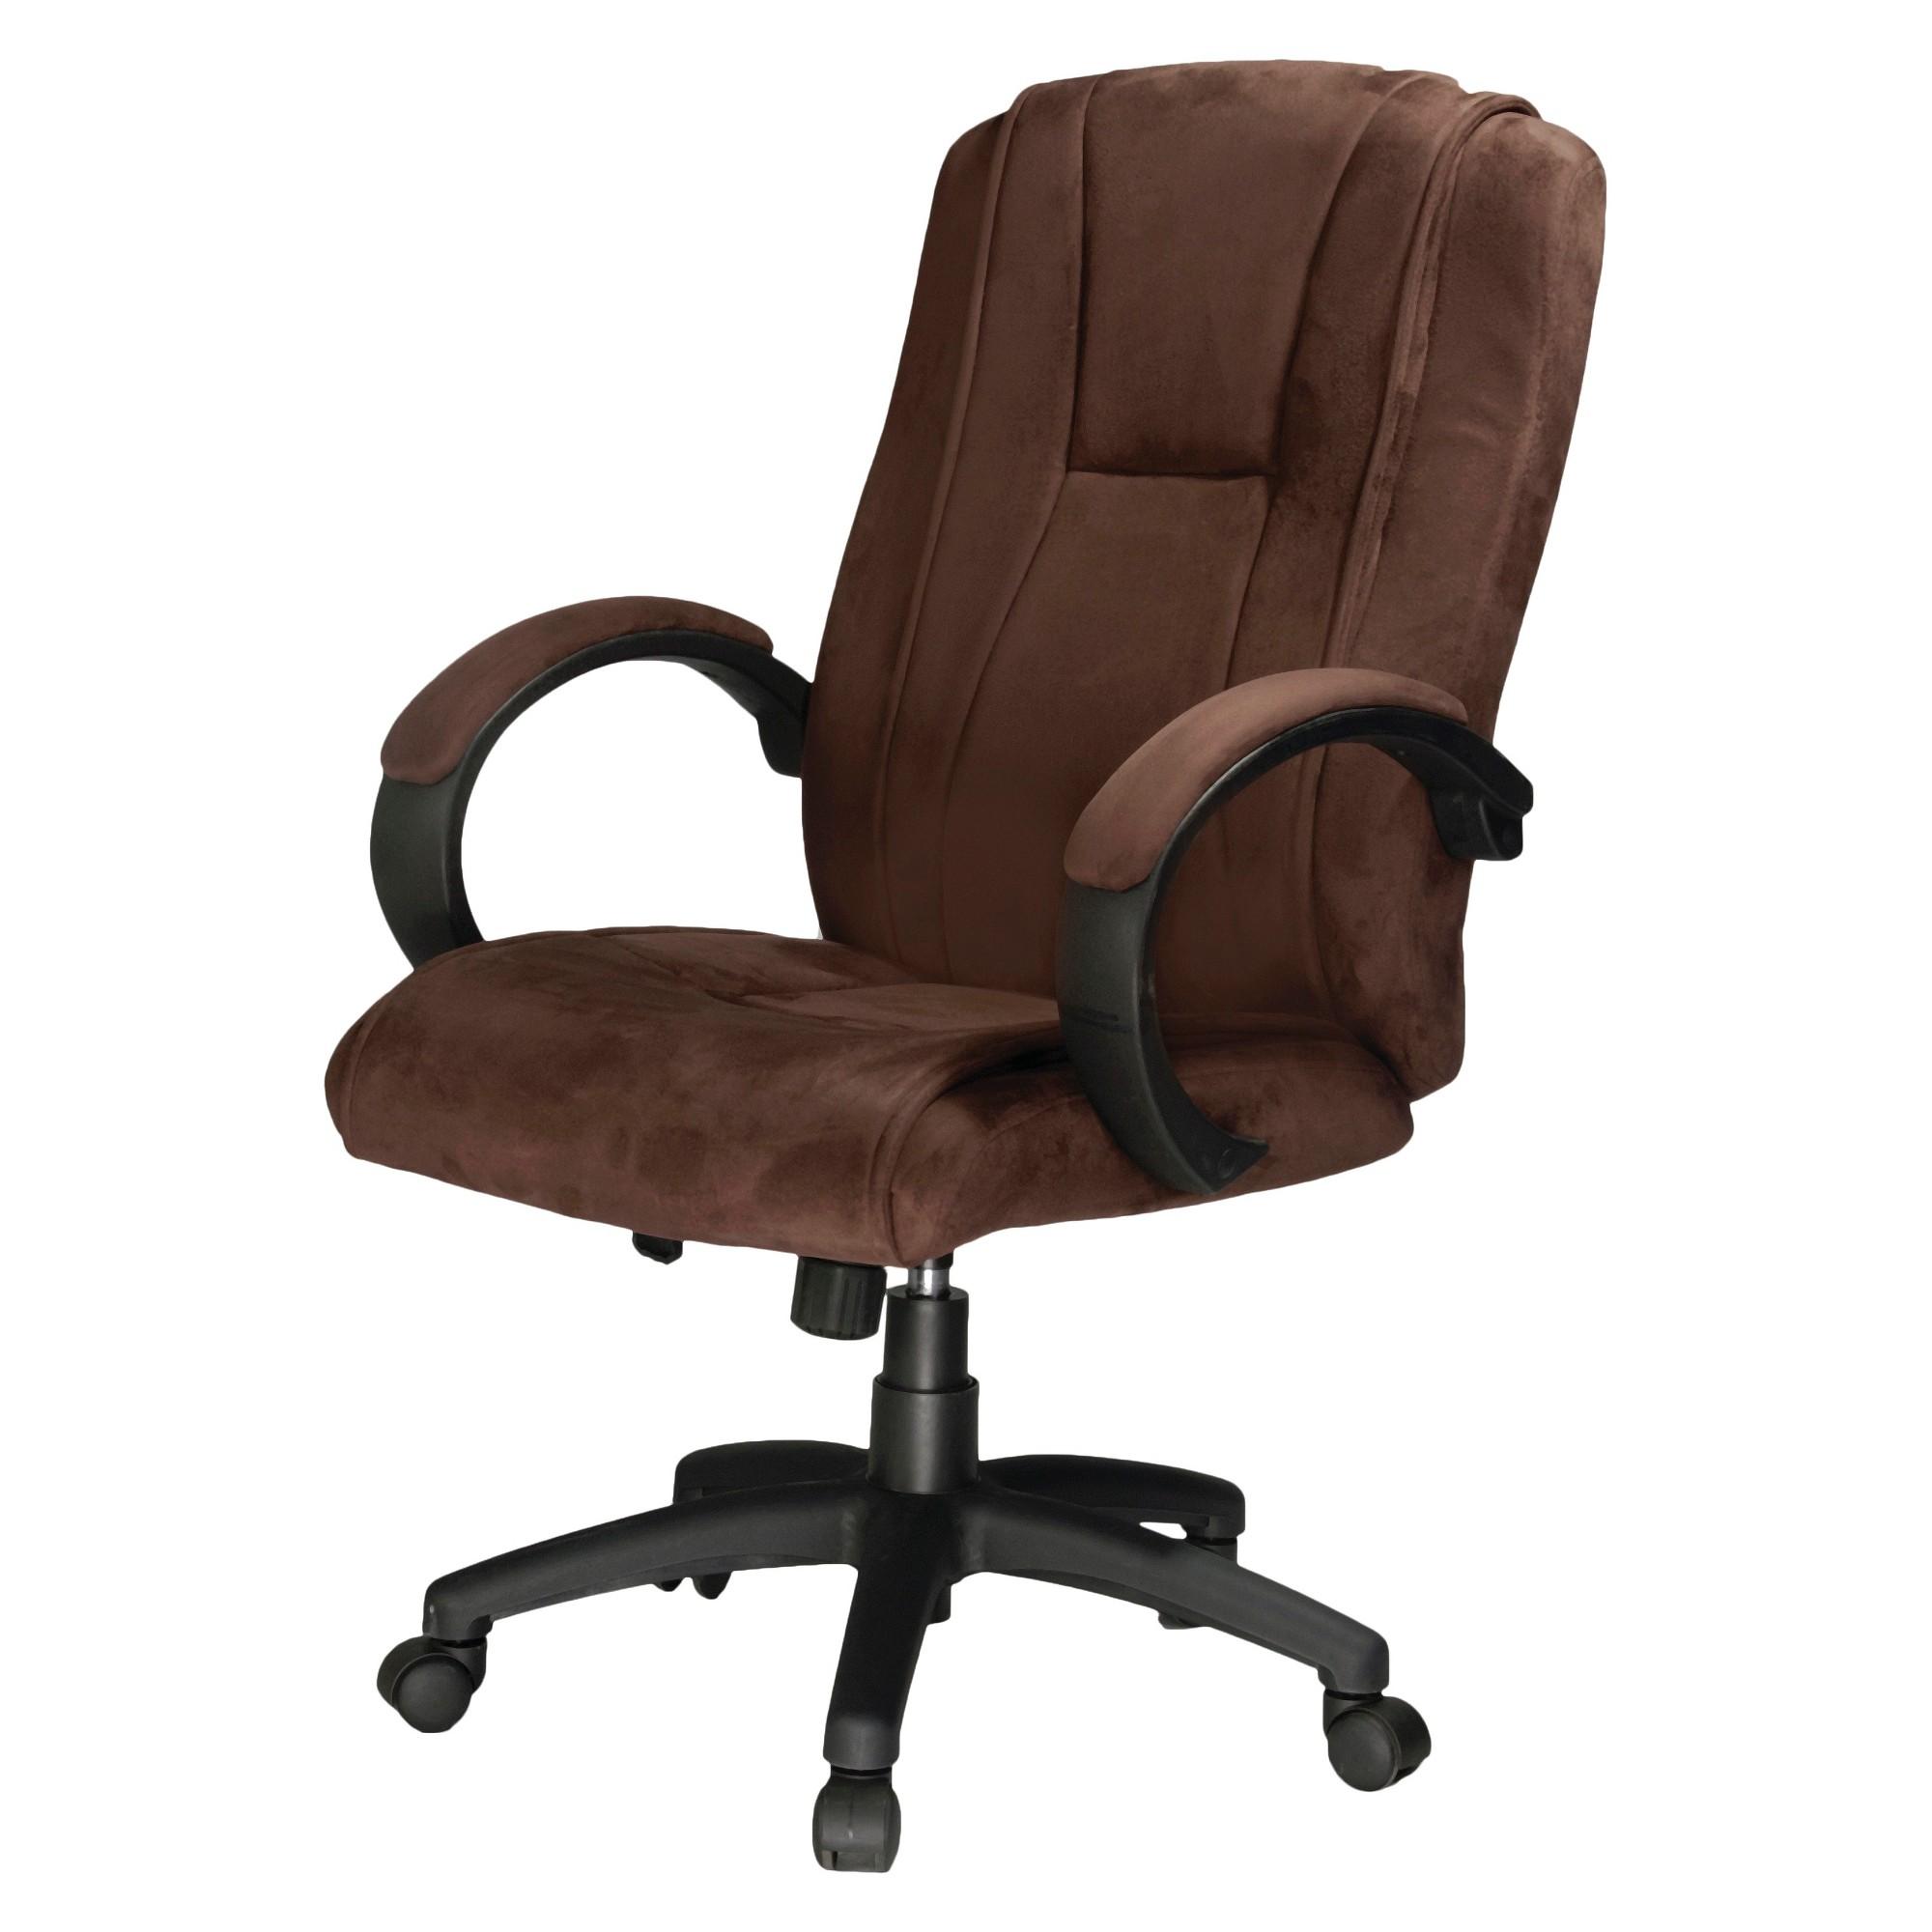 Padded Microfiber Fabric Executive Chair